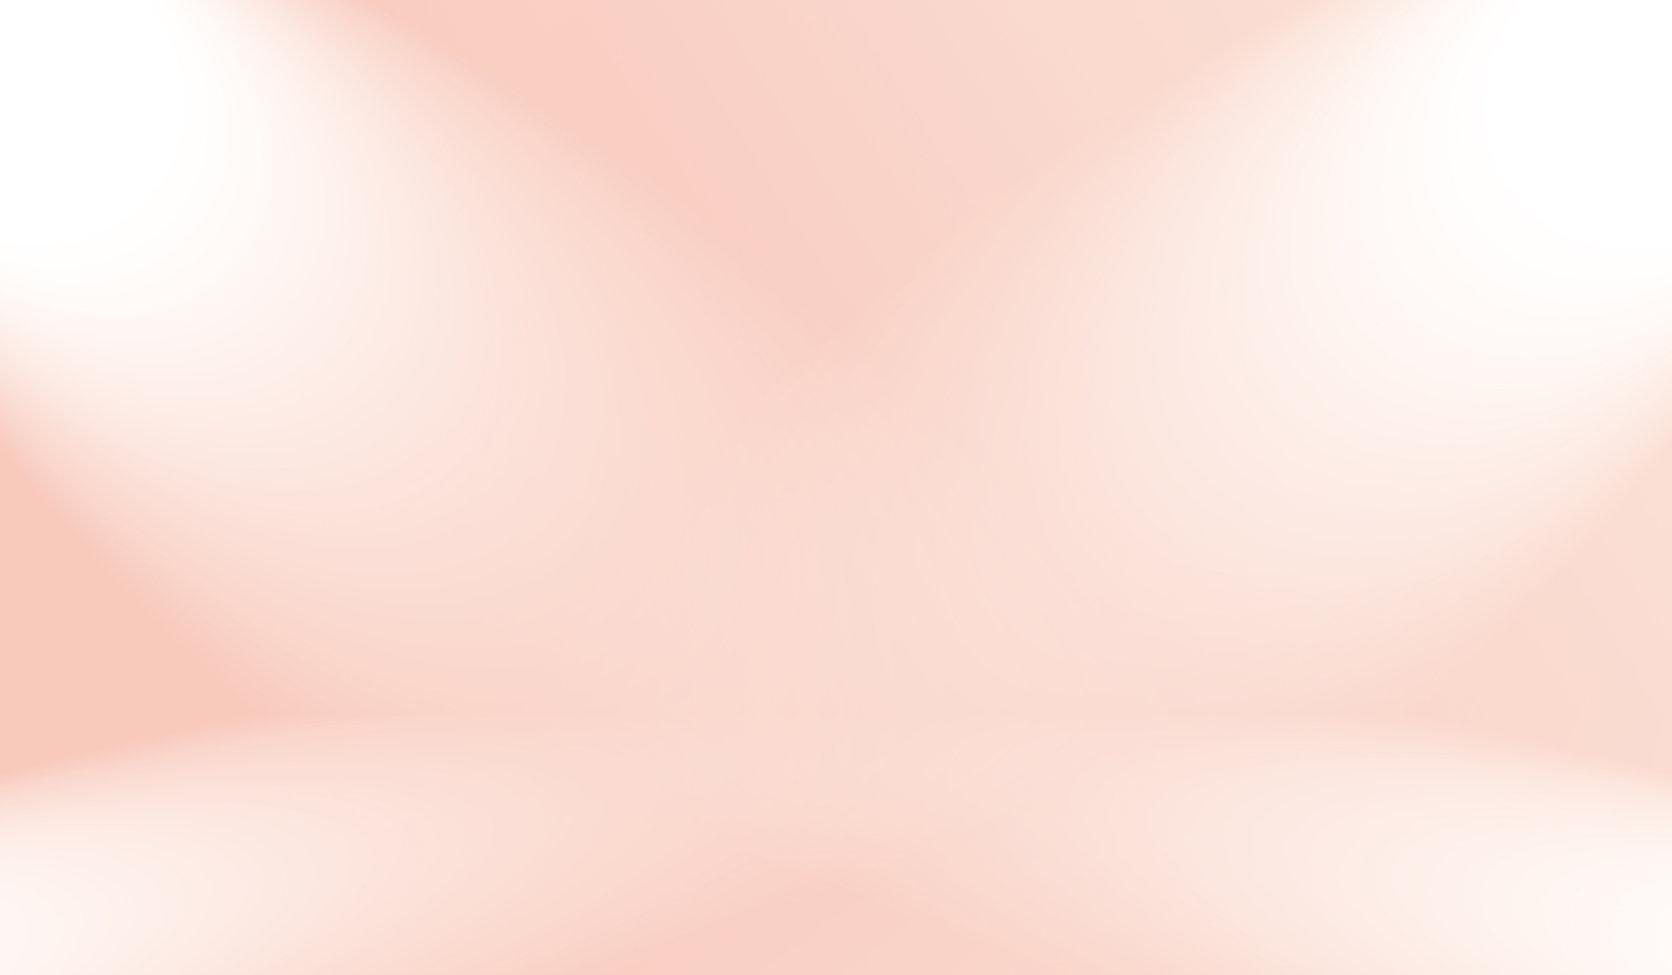 abstract-blur-pastel-beautiful-peach-pin